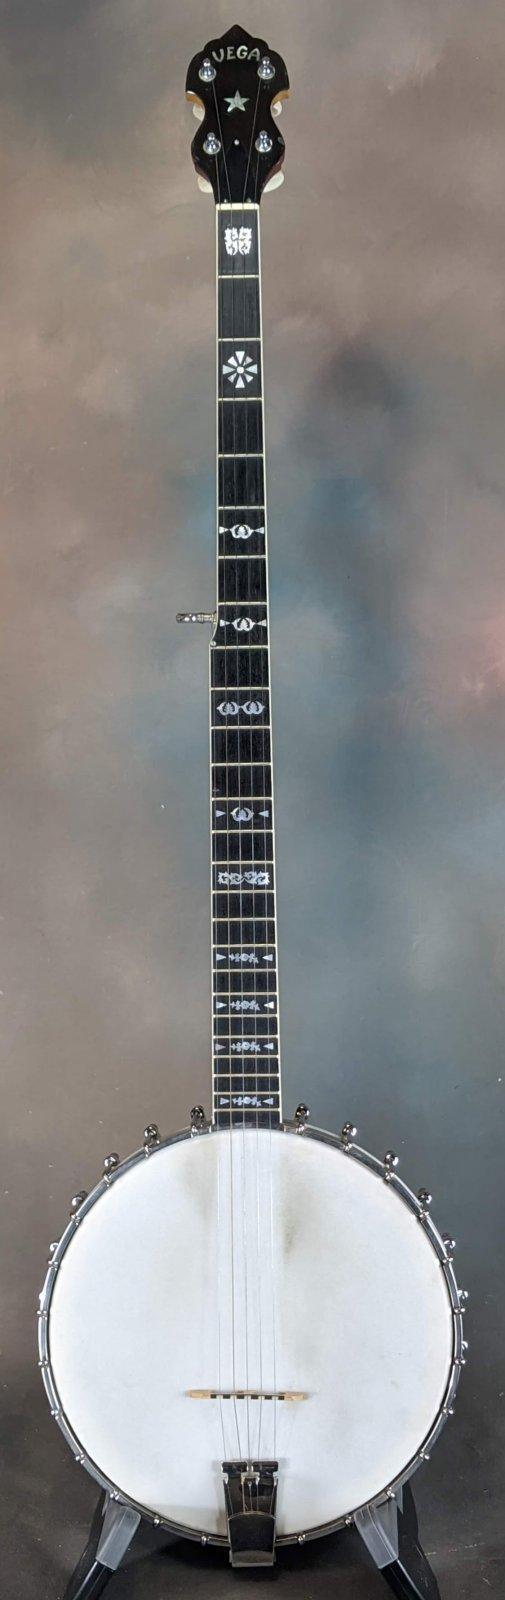 Used Vega Pete Seeger longneck banjo